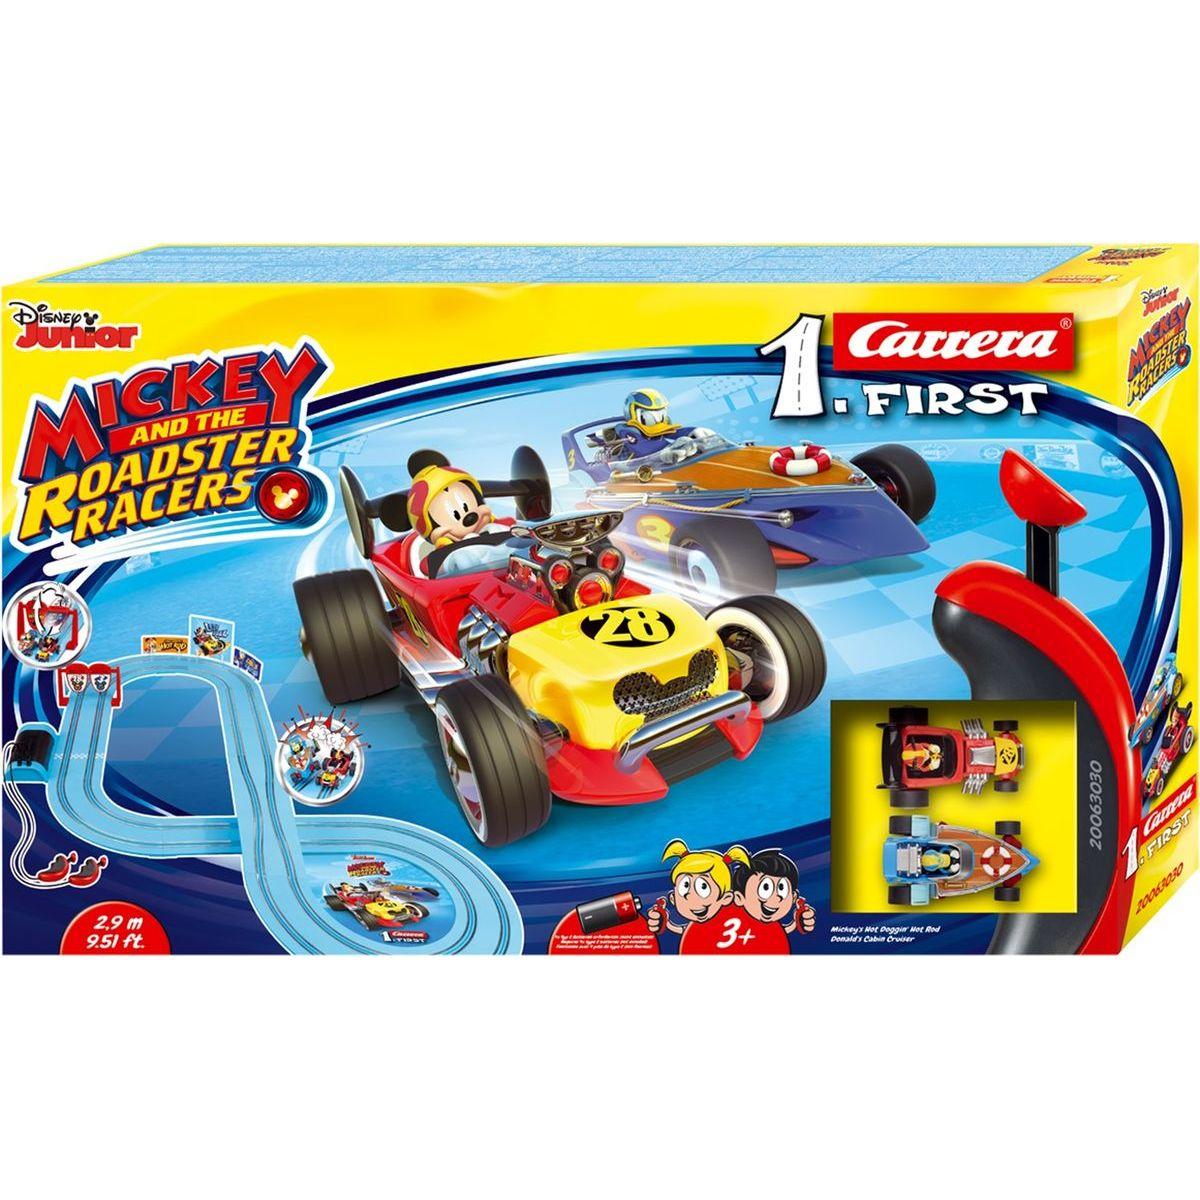 Carrera First Disney autodráha 63030 Mickey Racers